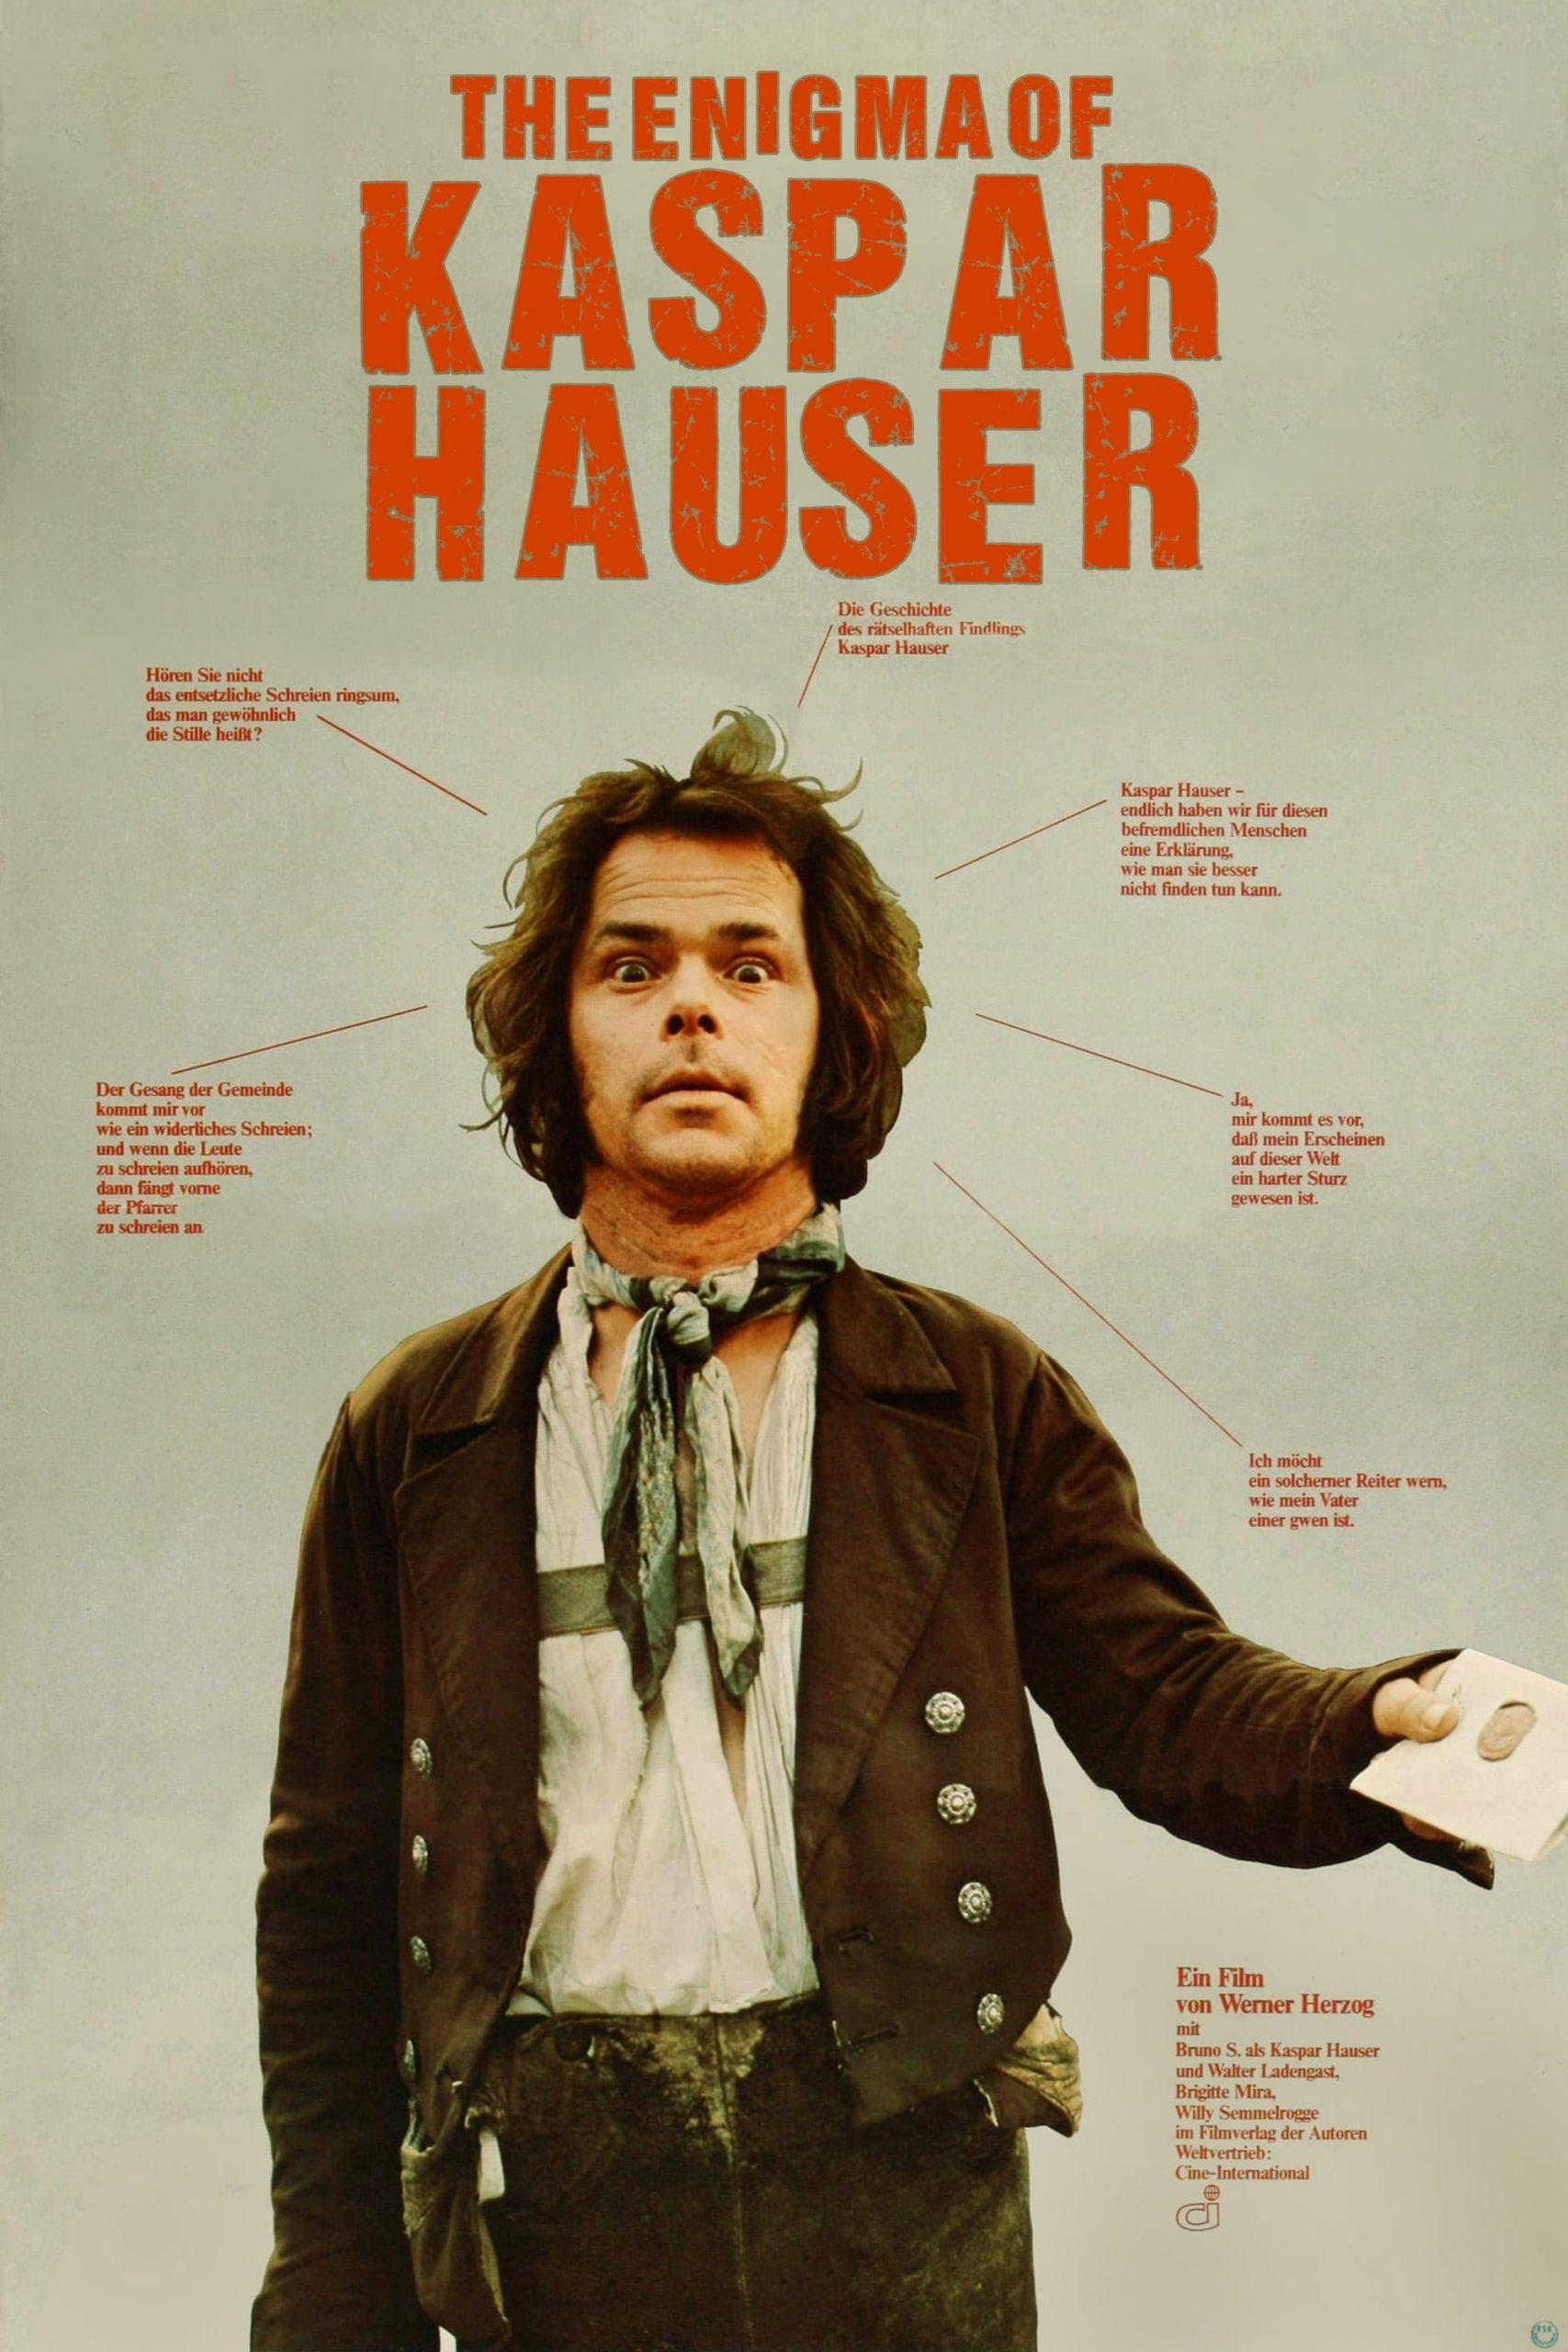 Poster for The Enigma of Kaspar Hauser